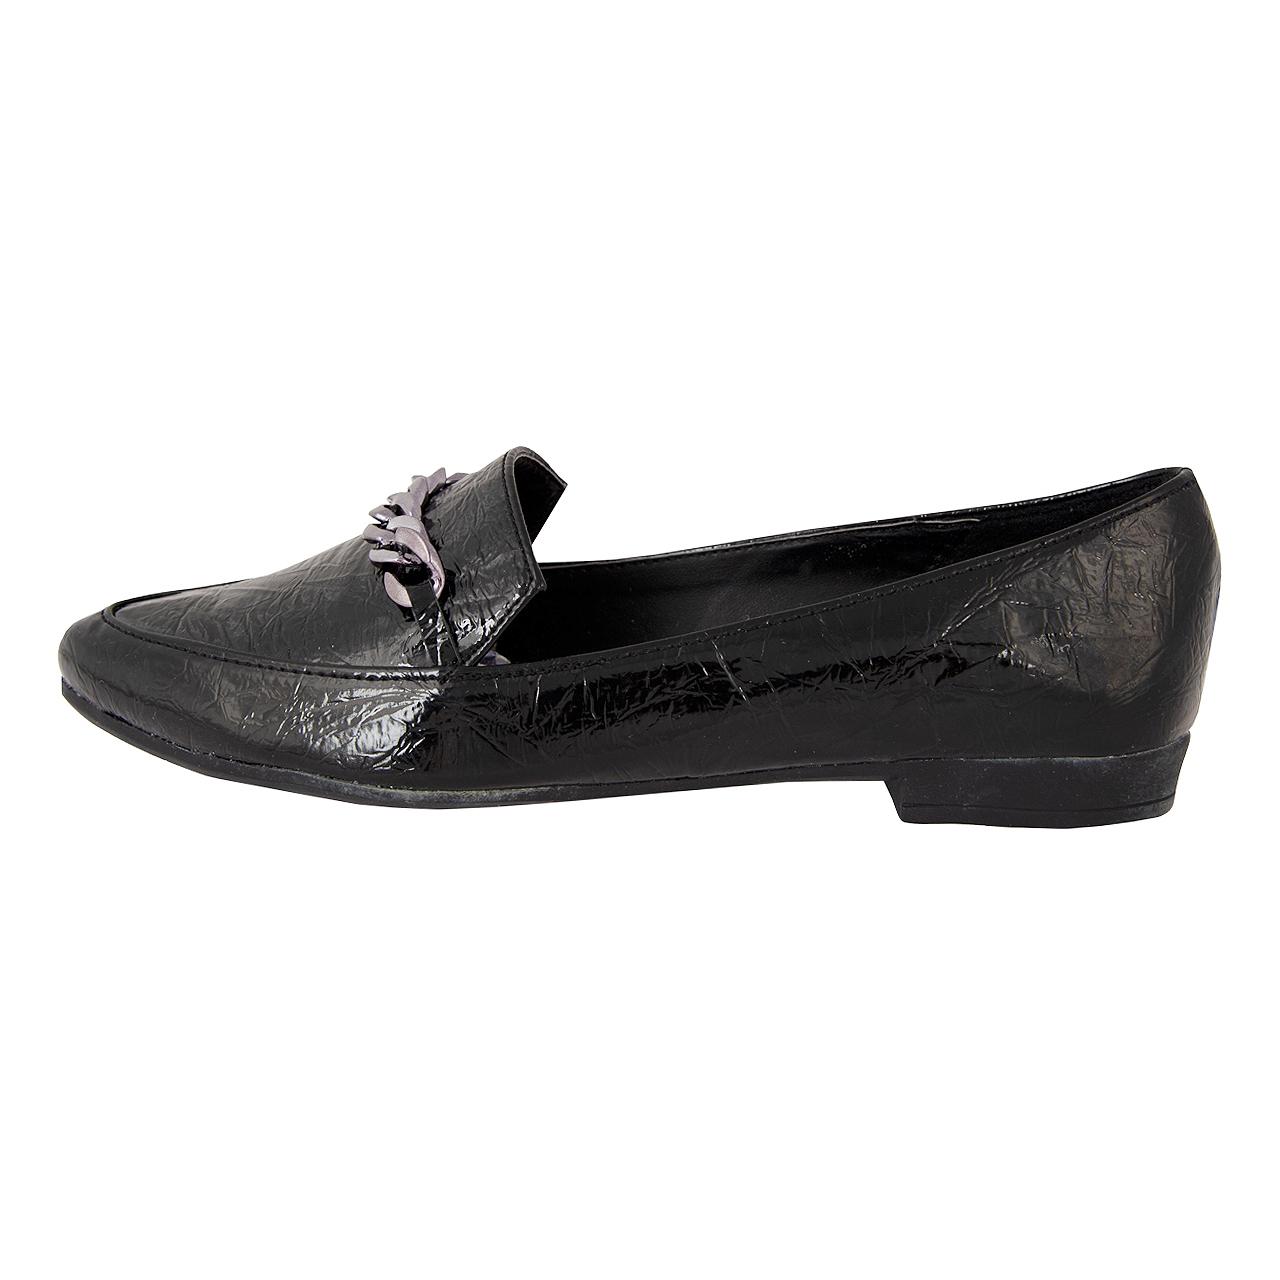 تصویر کفش زنانه کد 159010102